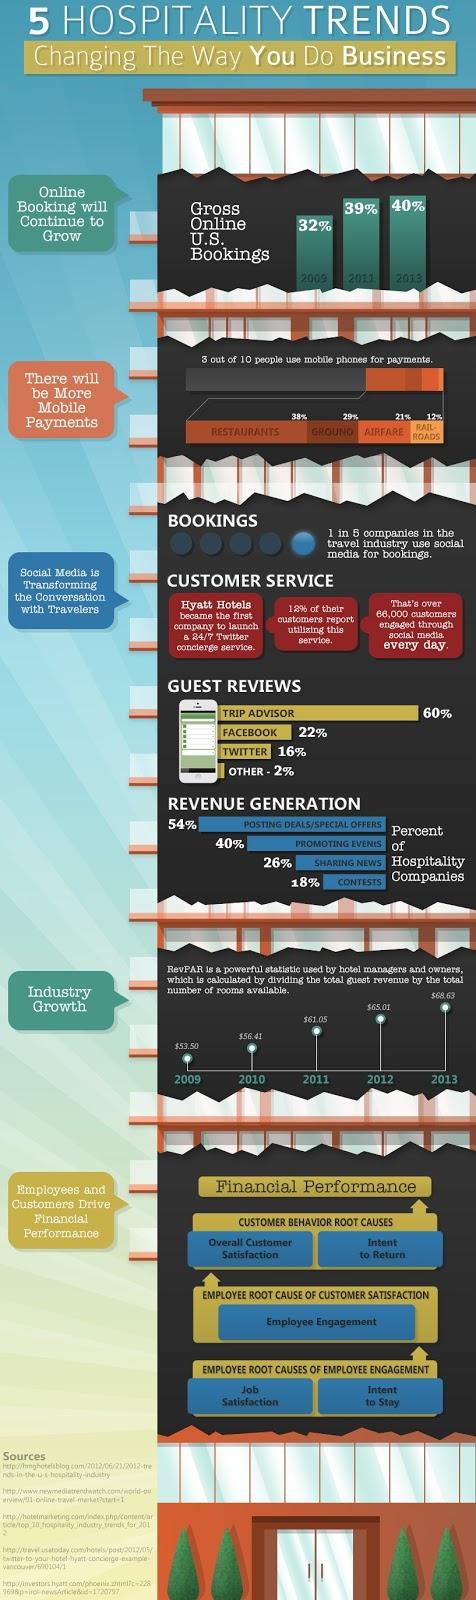 ResNet World - Travel Industry Trends